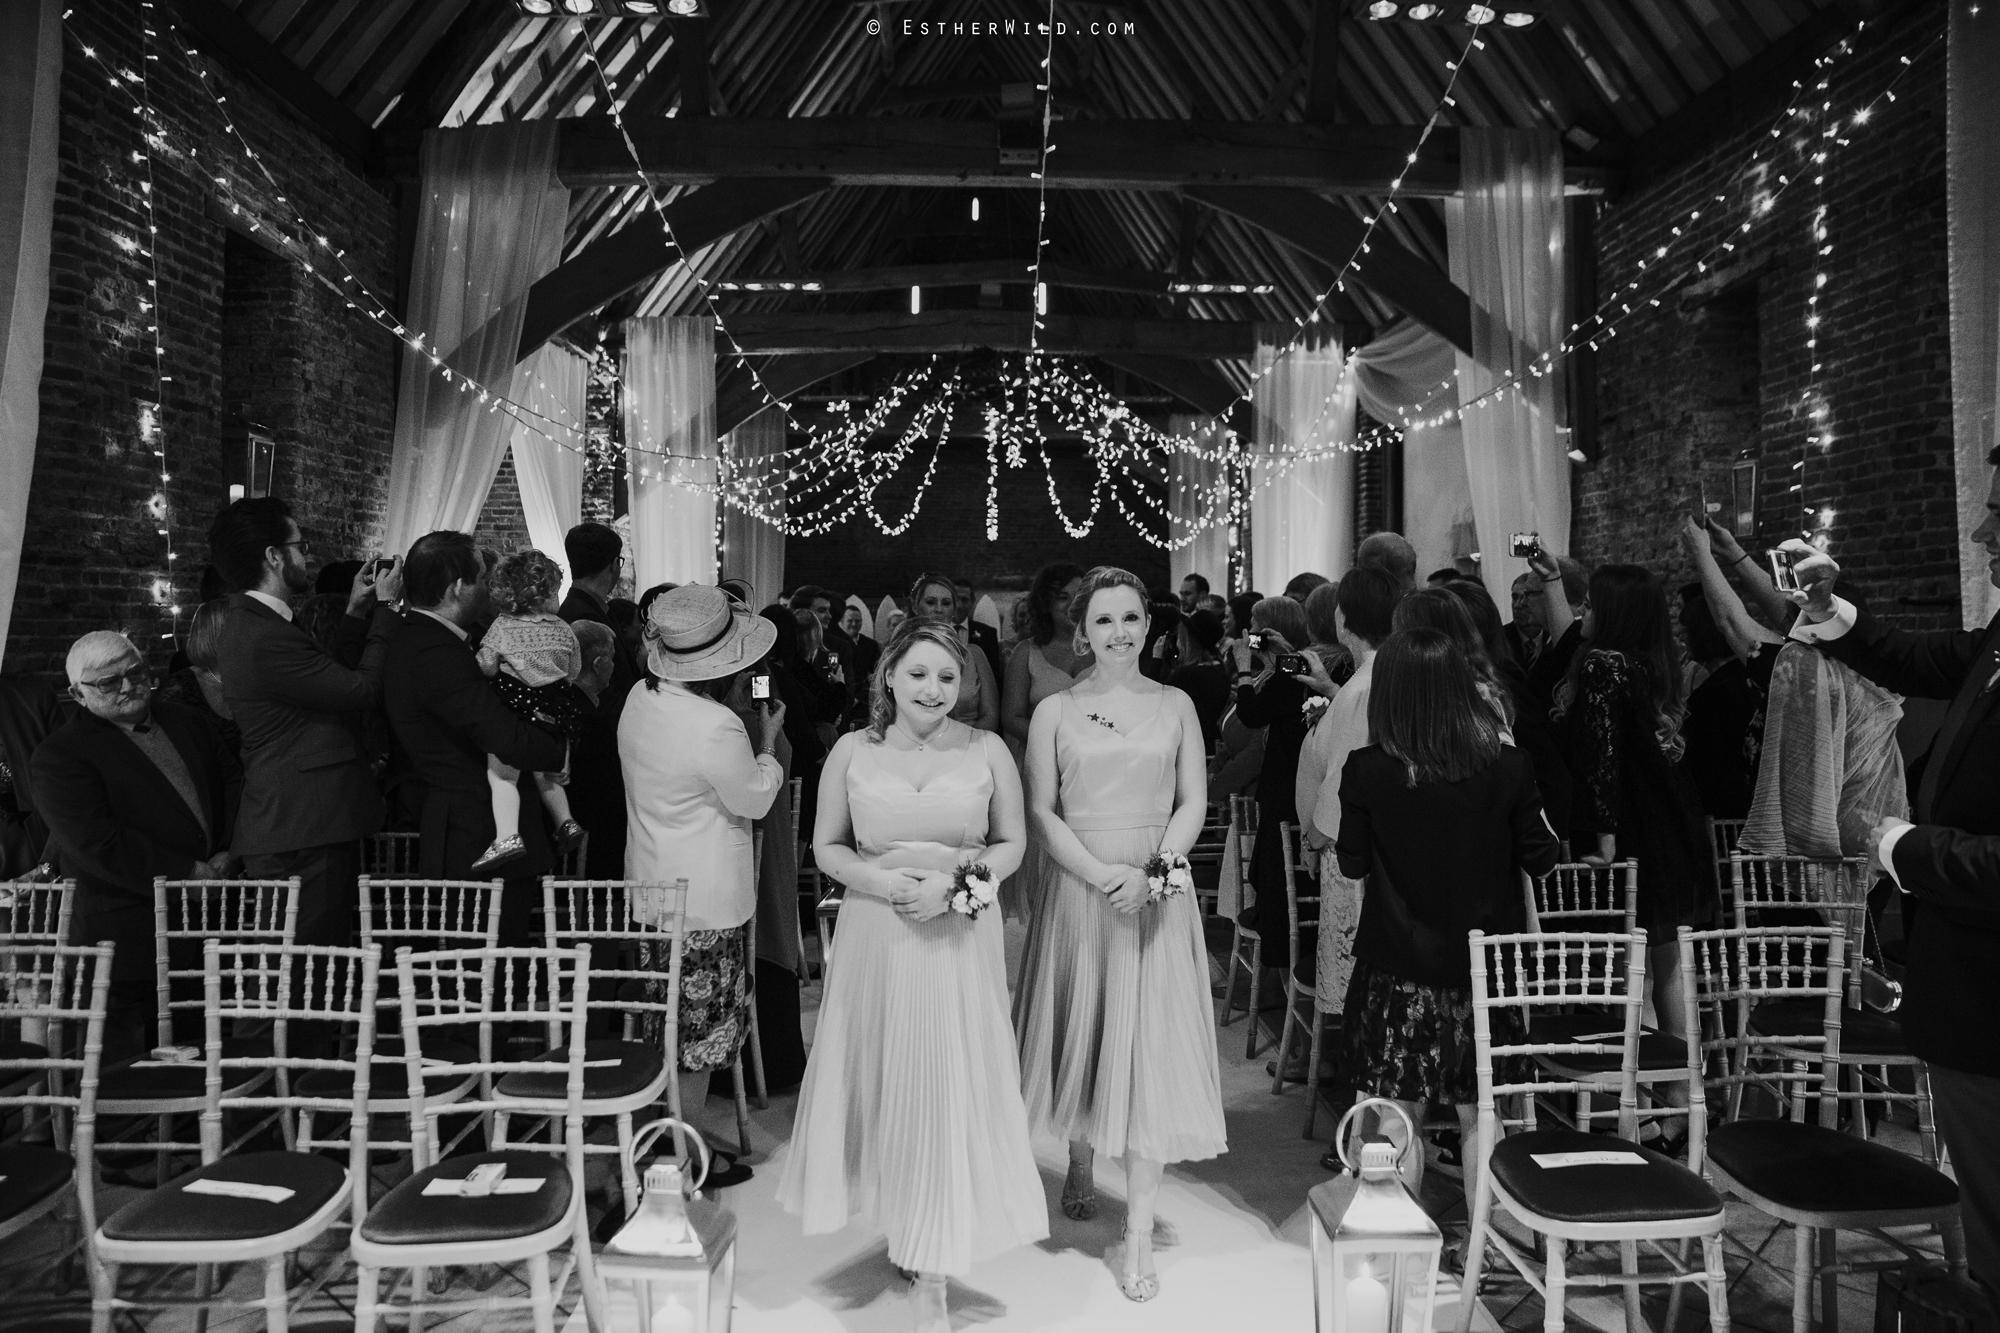 Elms_Barn_Weddings_Suffolk_Photographer_Copyright_Esther_Wild_IMG_1061-2.jpg